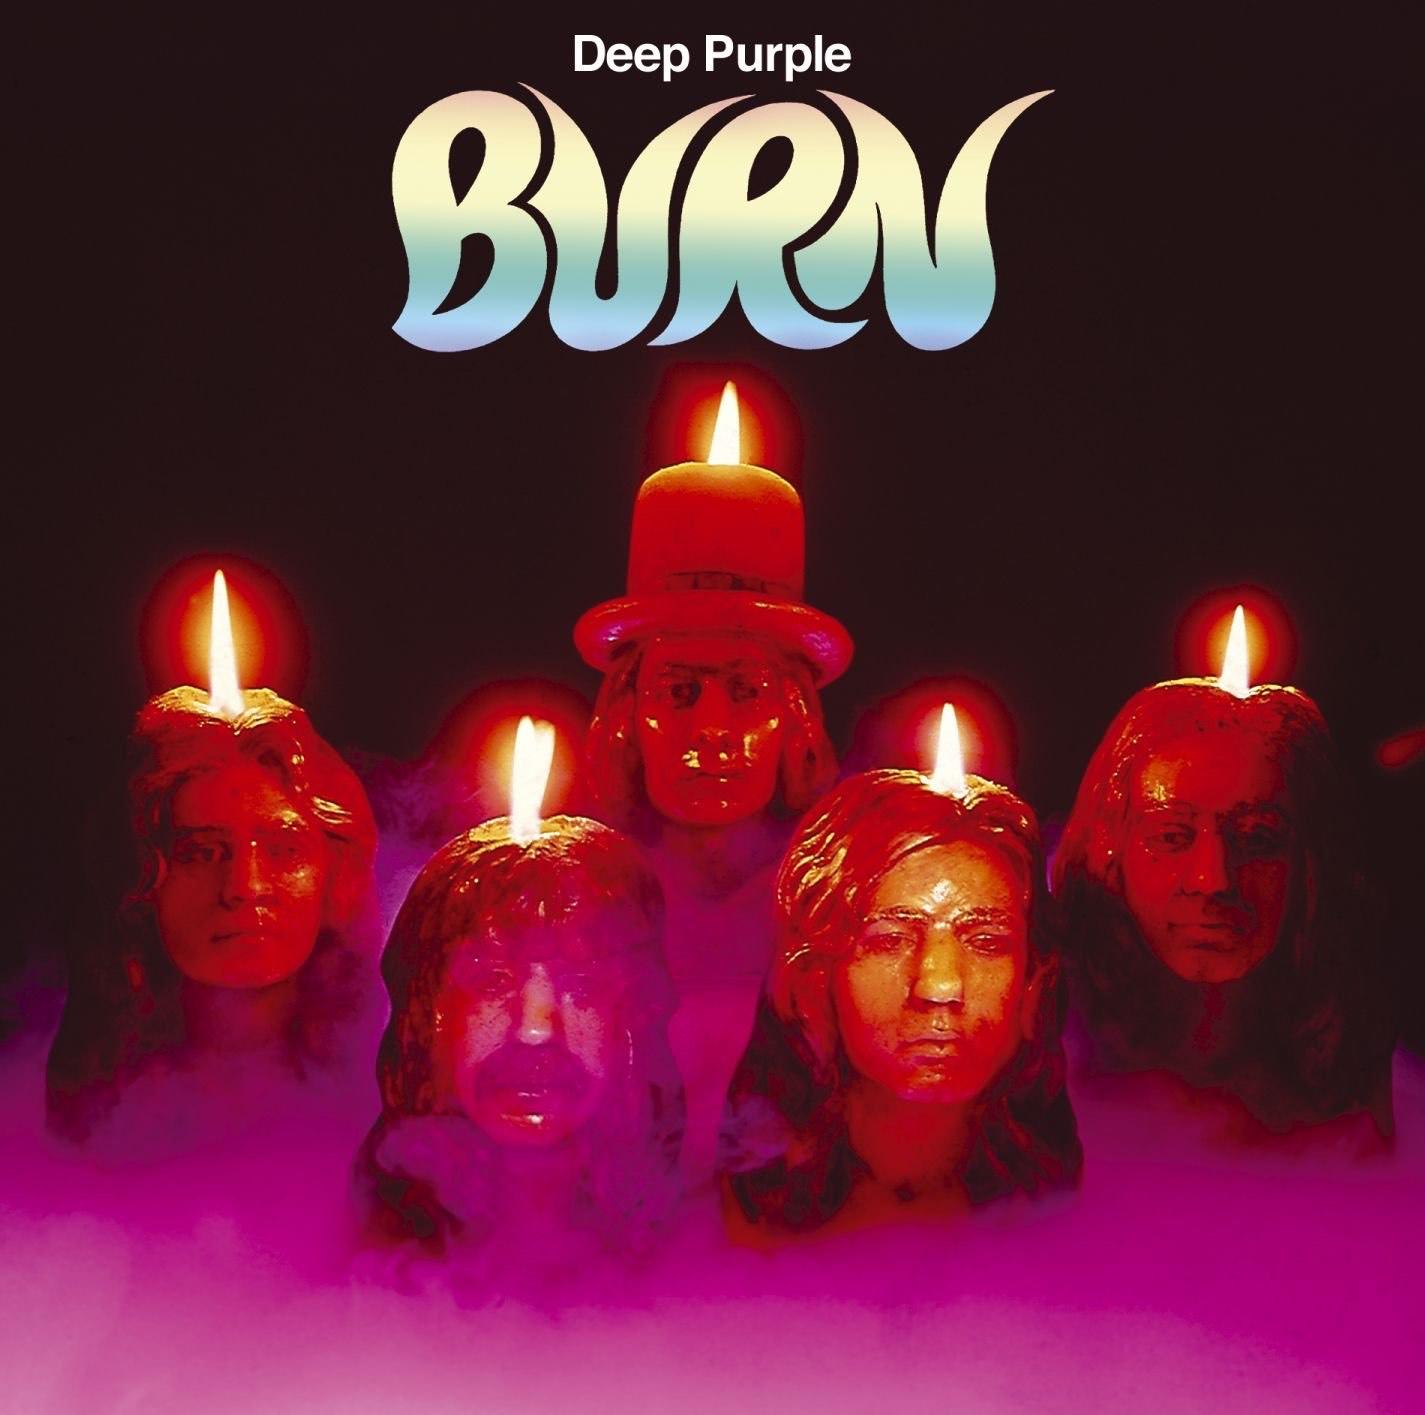 Burn-Deep-Purple--1626558149